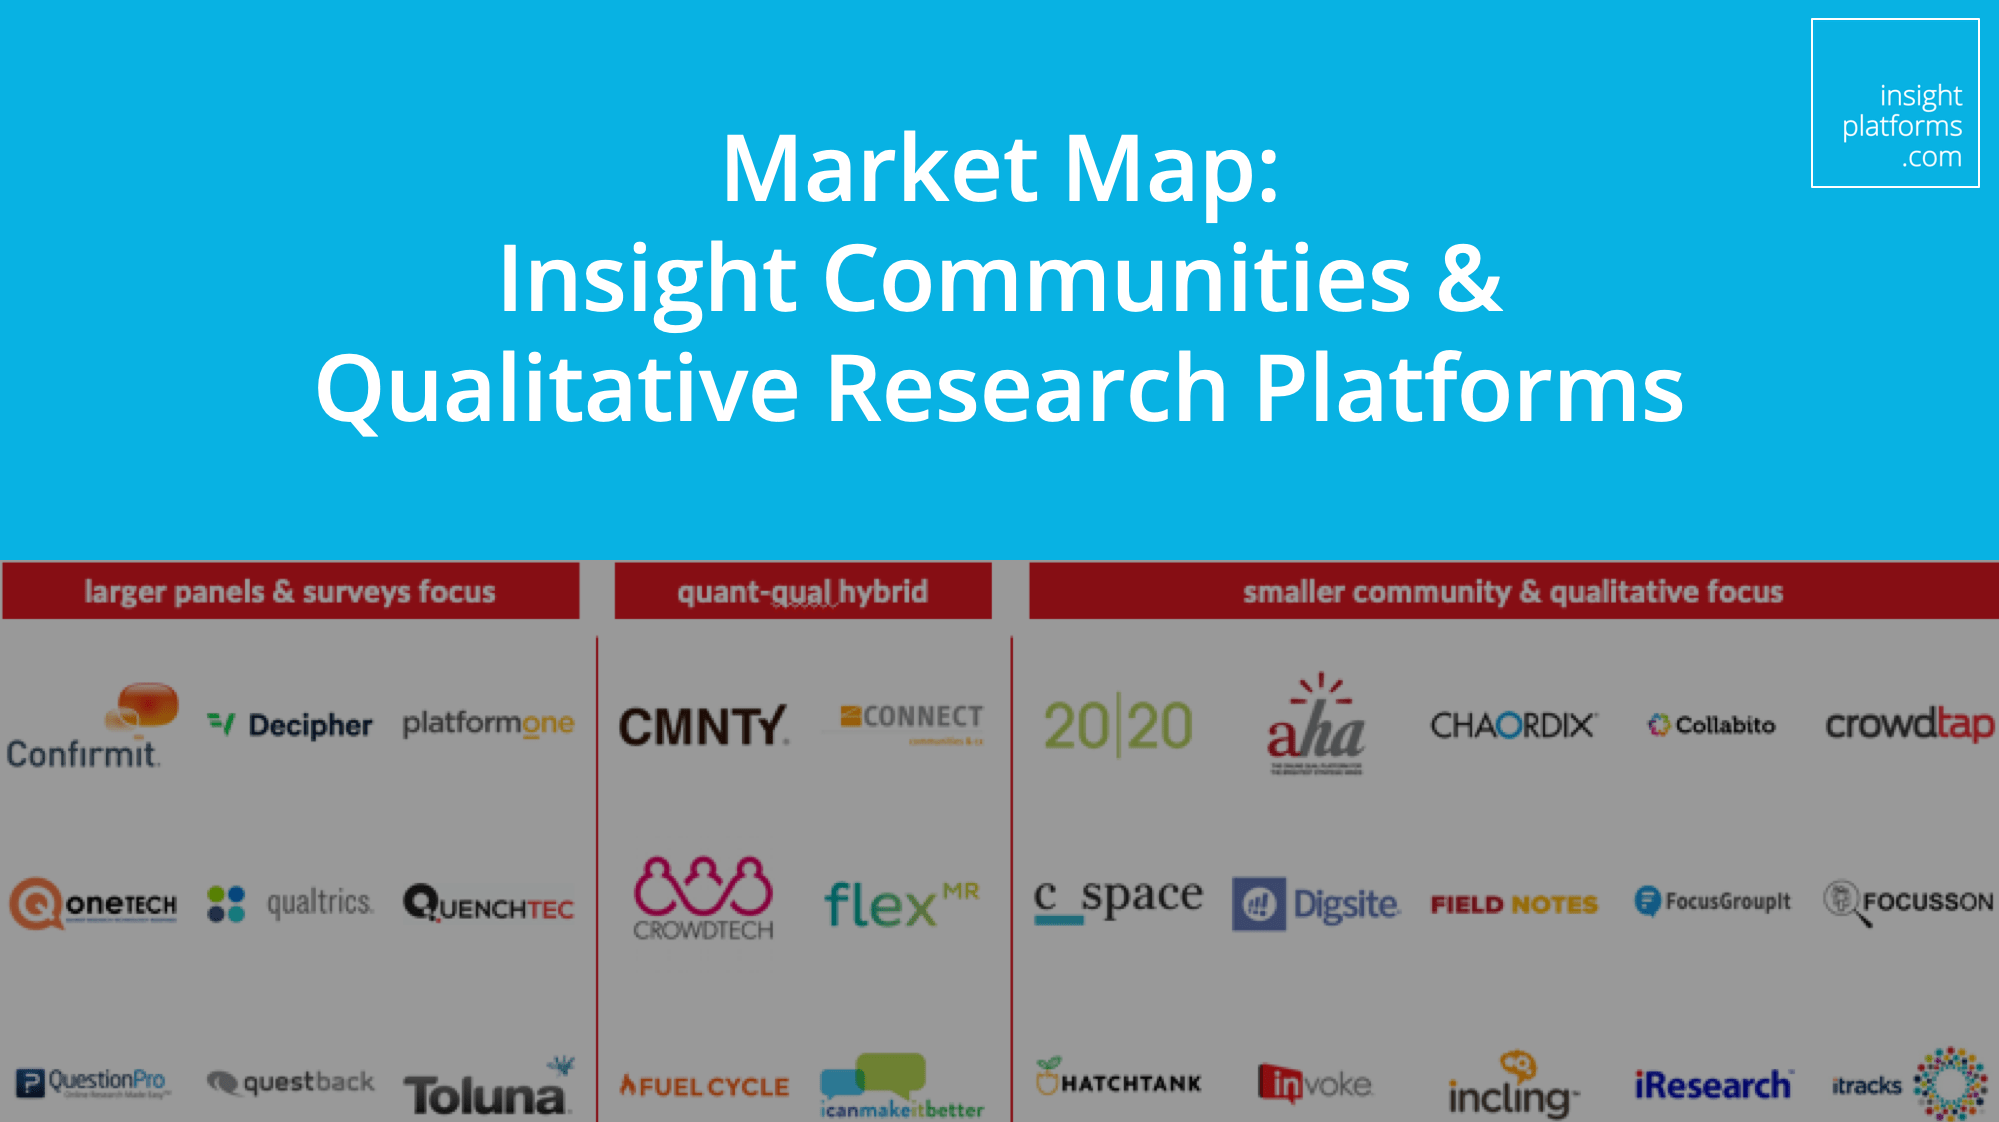 Insight Communities Qual Research Platforms Market Map